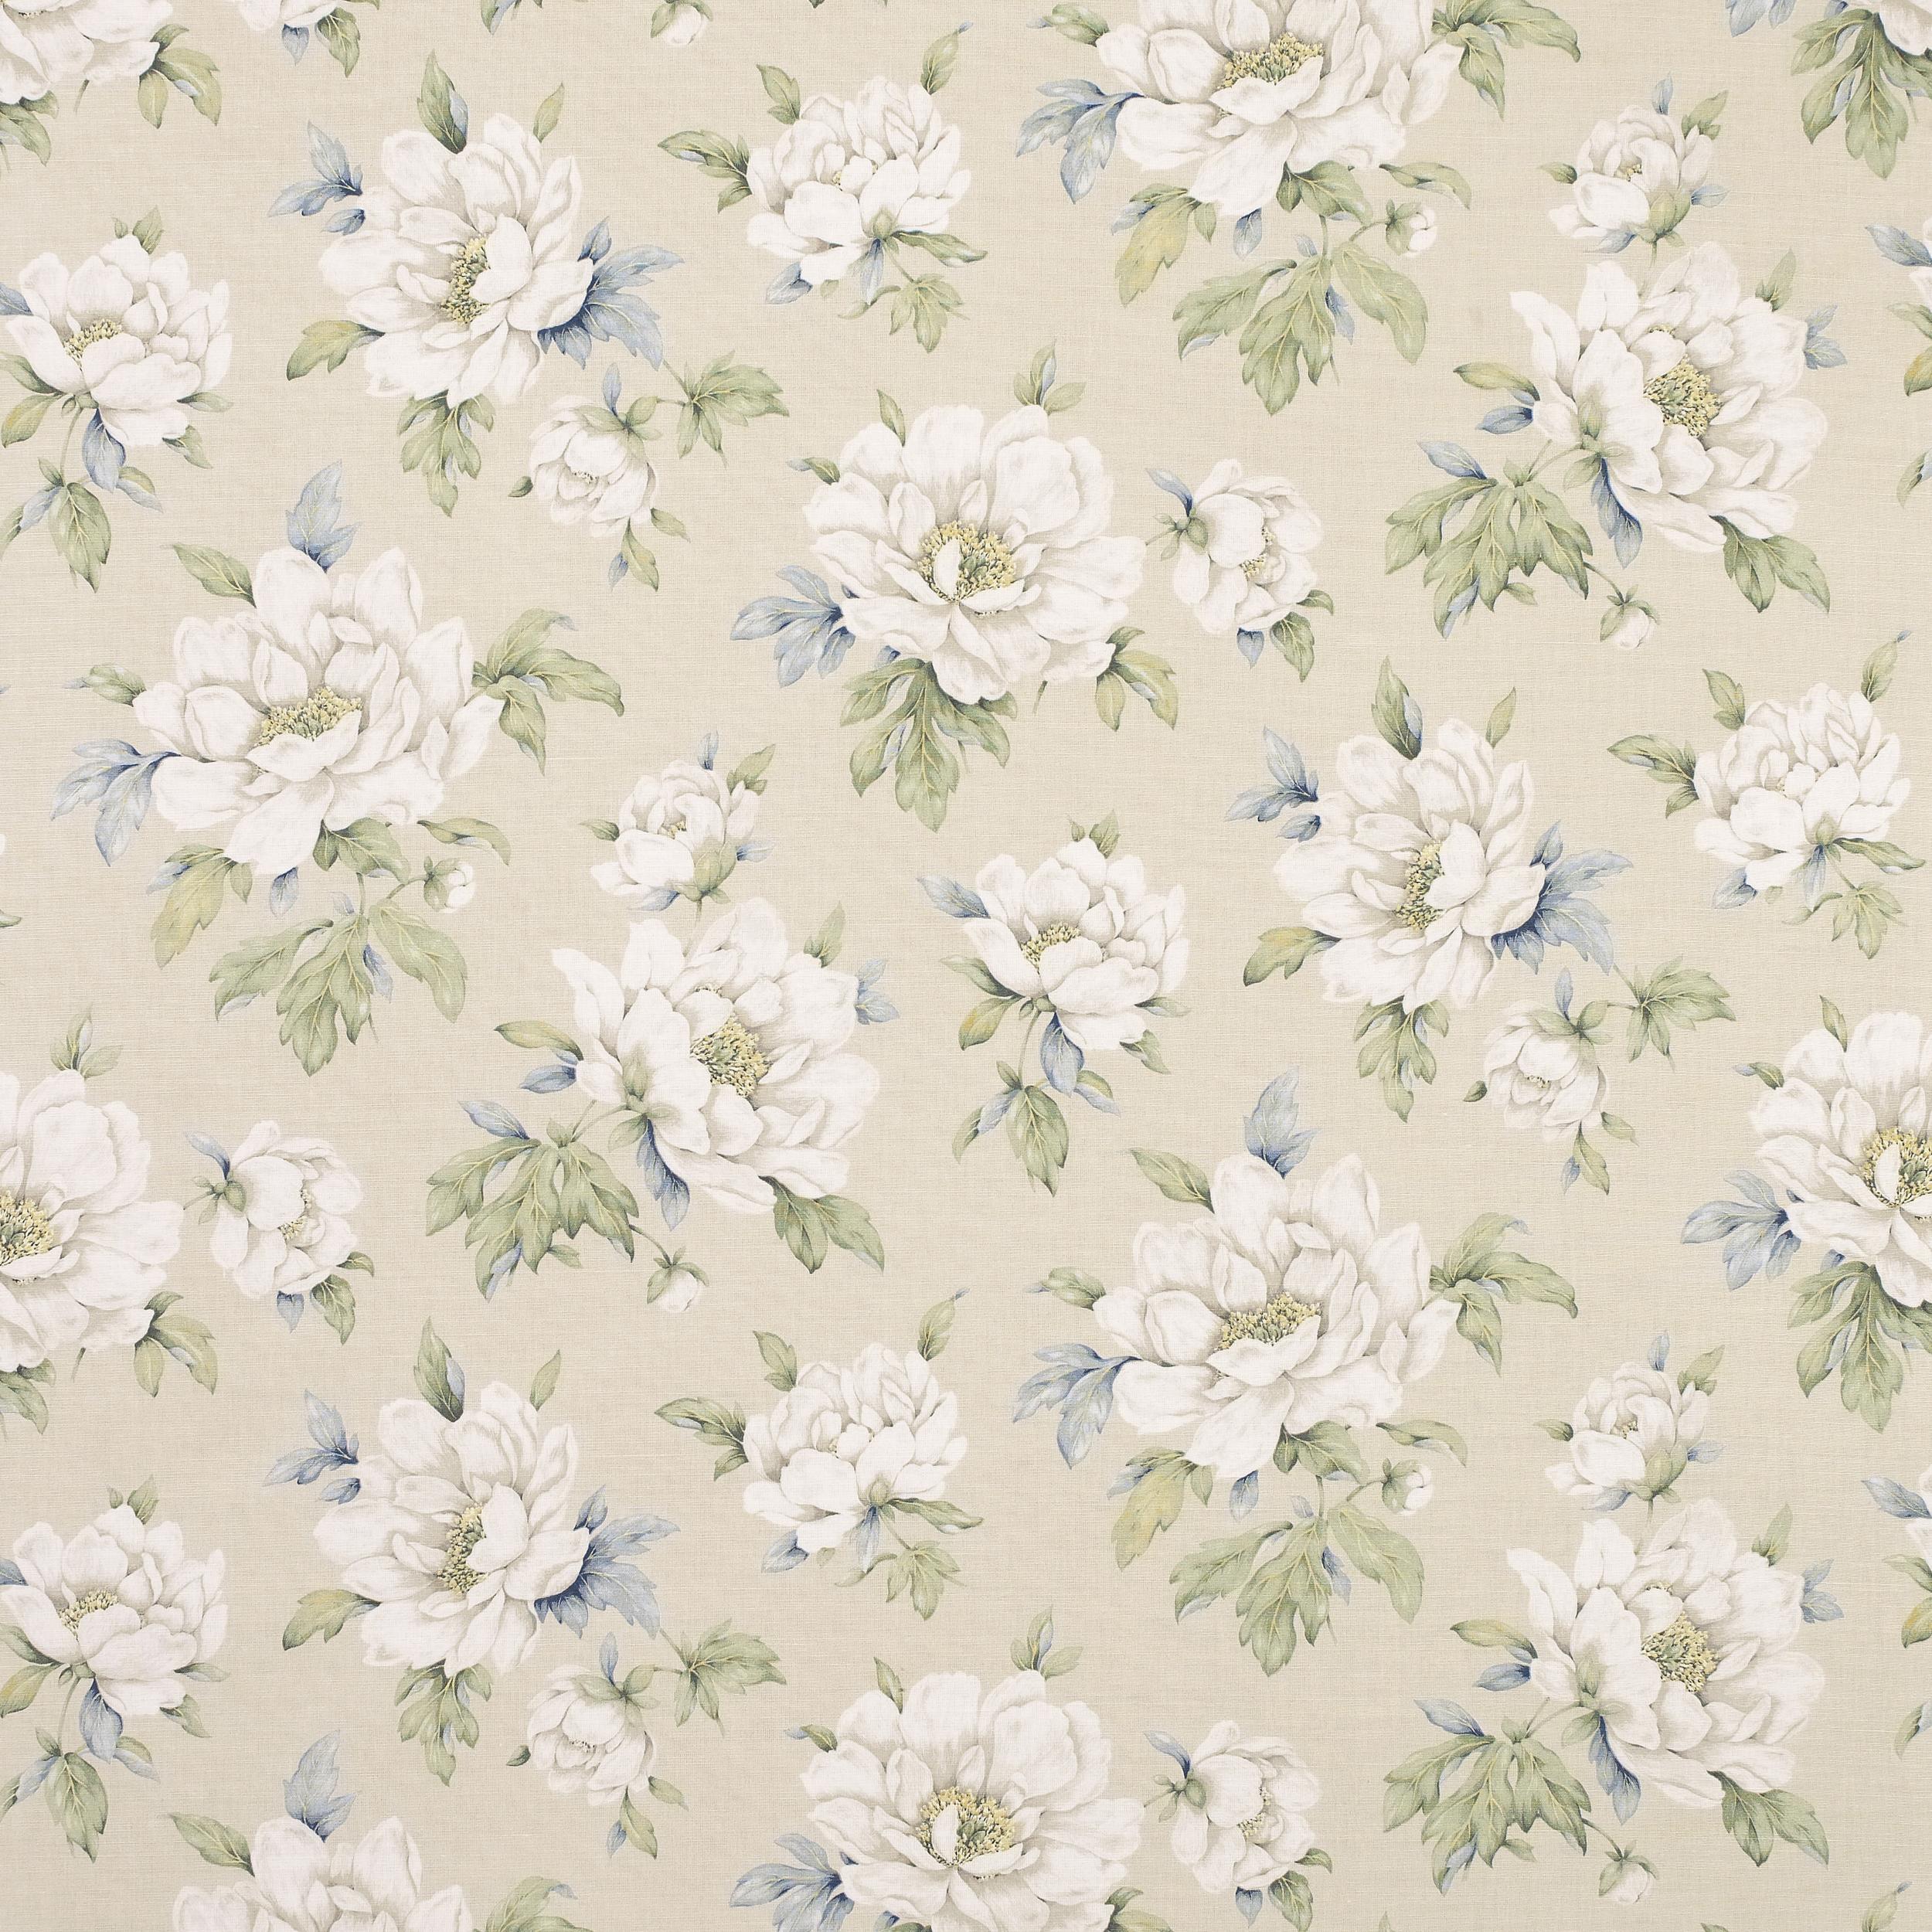 [47+] Large Floral Print Wallpaper on WallpaperSafari